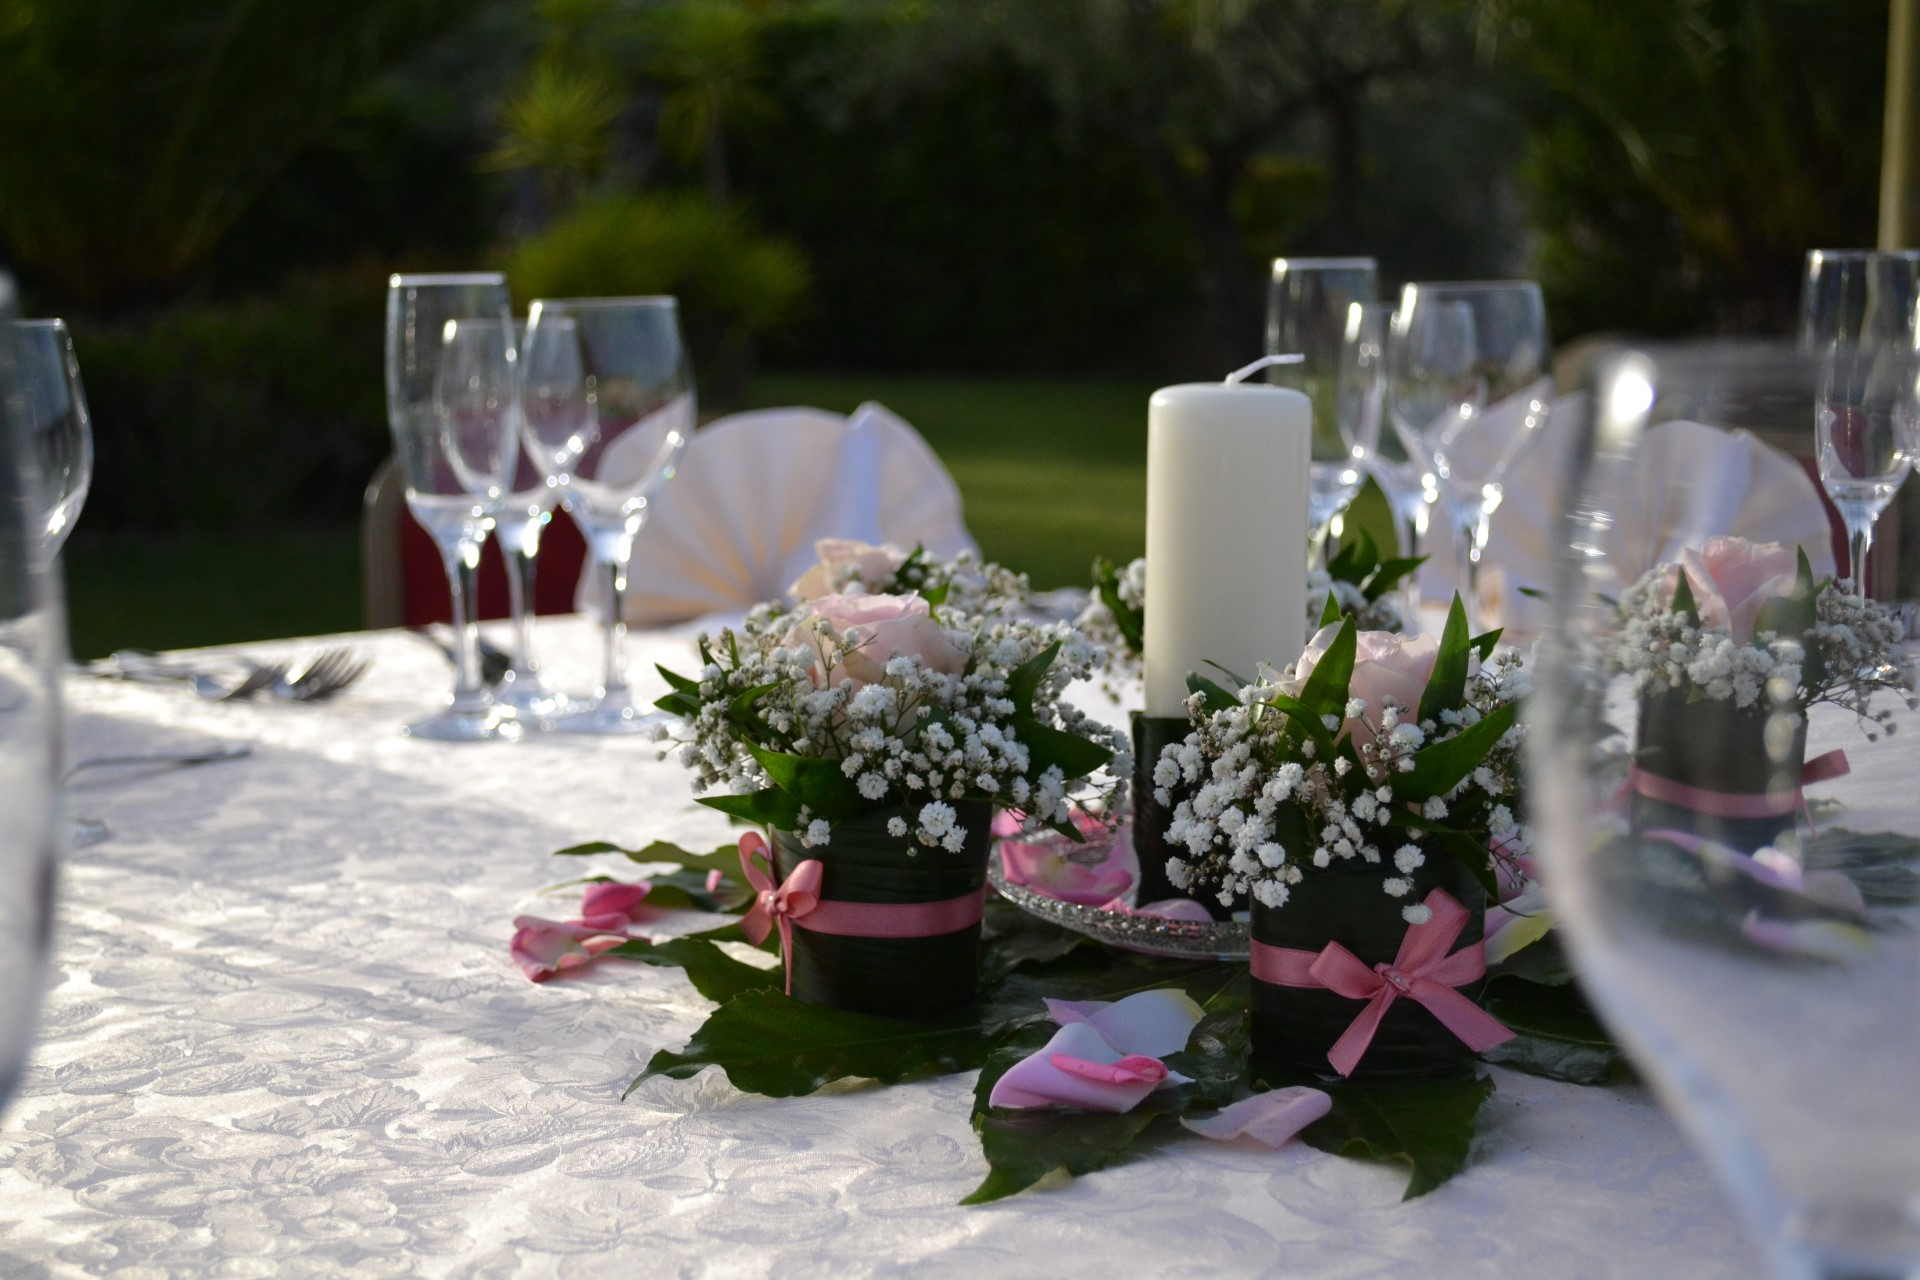 Le Magnolie Ristorante e Pizzeria | Wedding | Frigintini